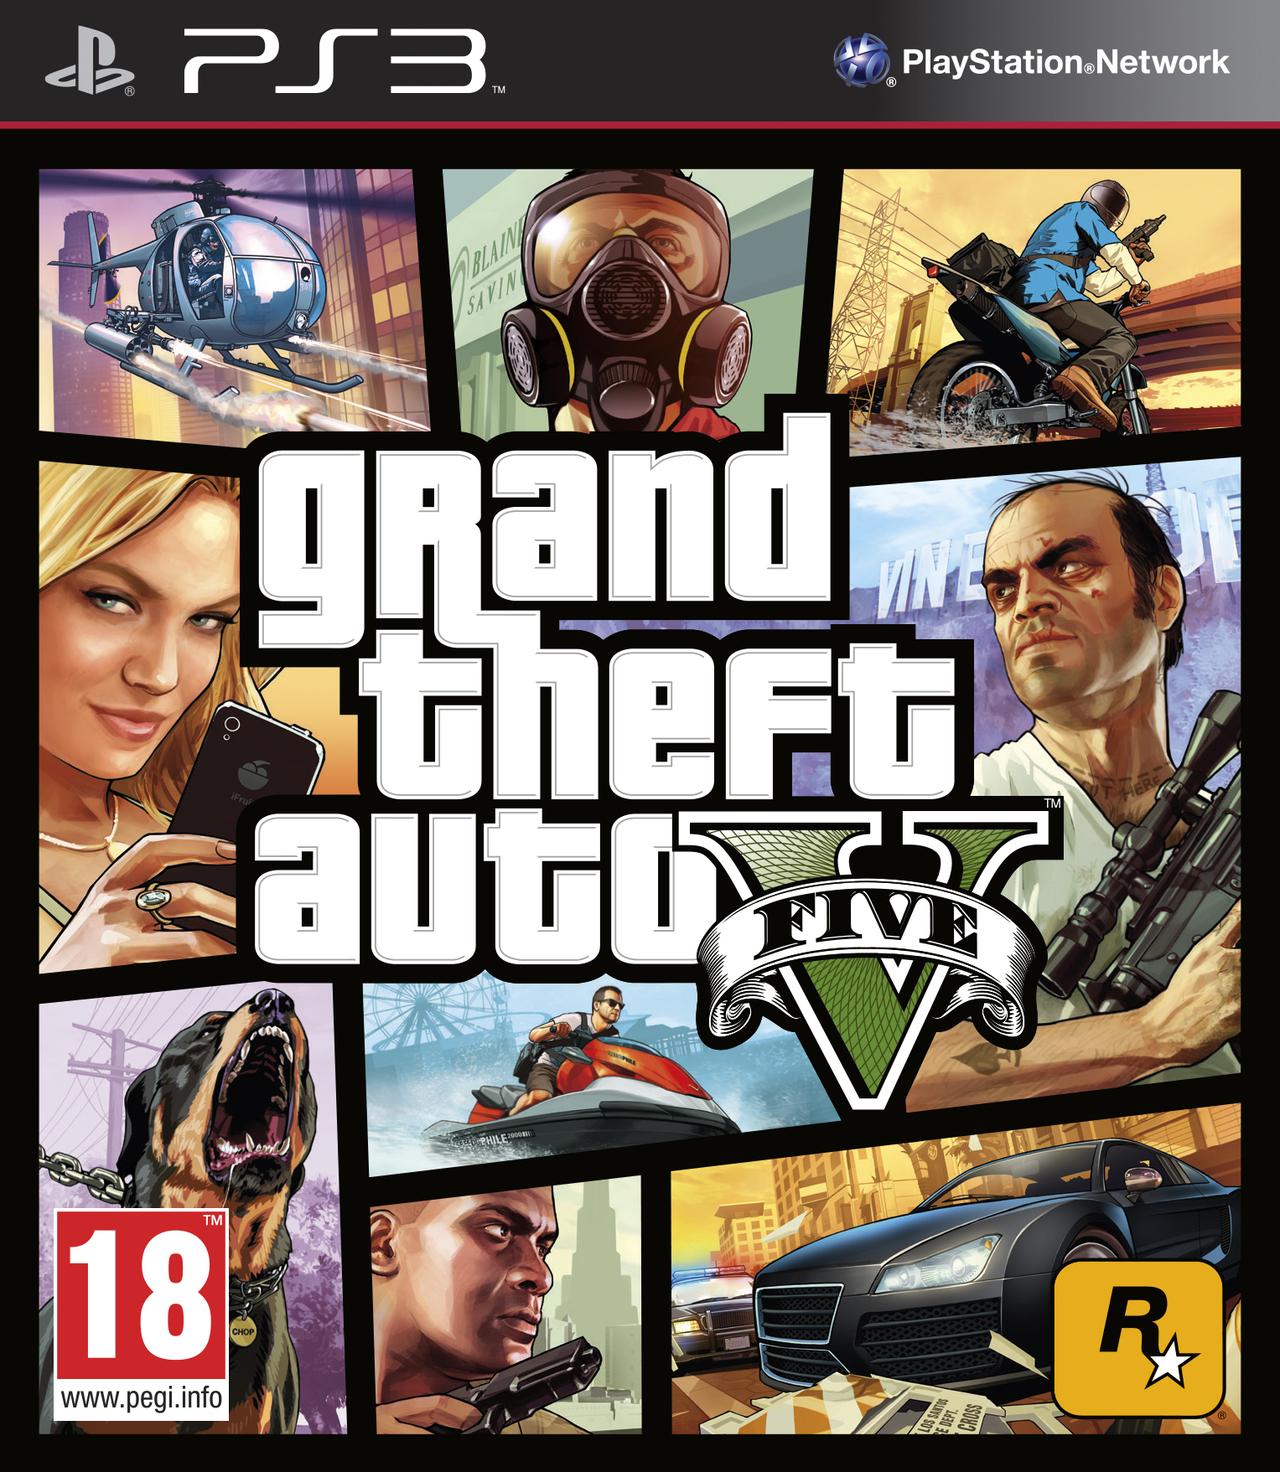 jaquette du jeu vidéo Grand Theft Auto V